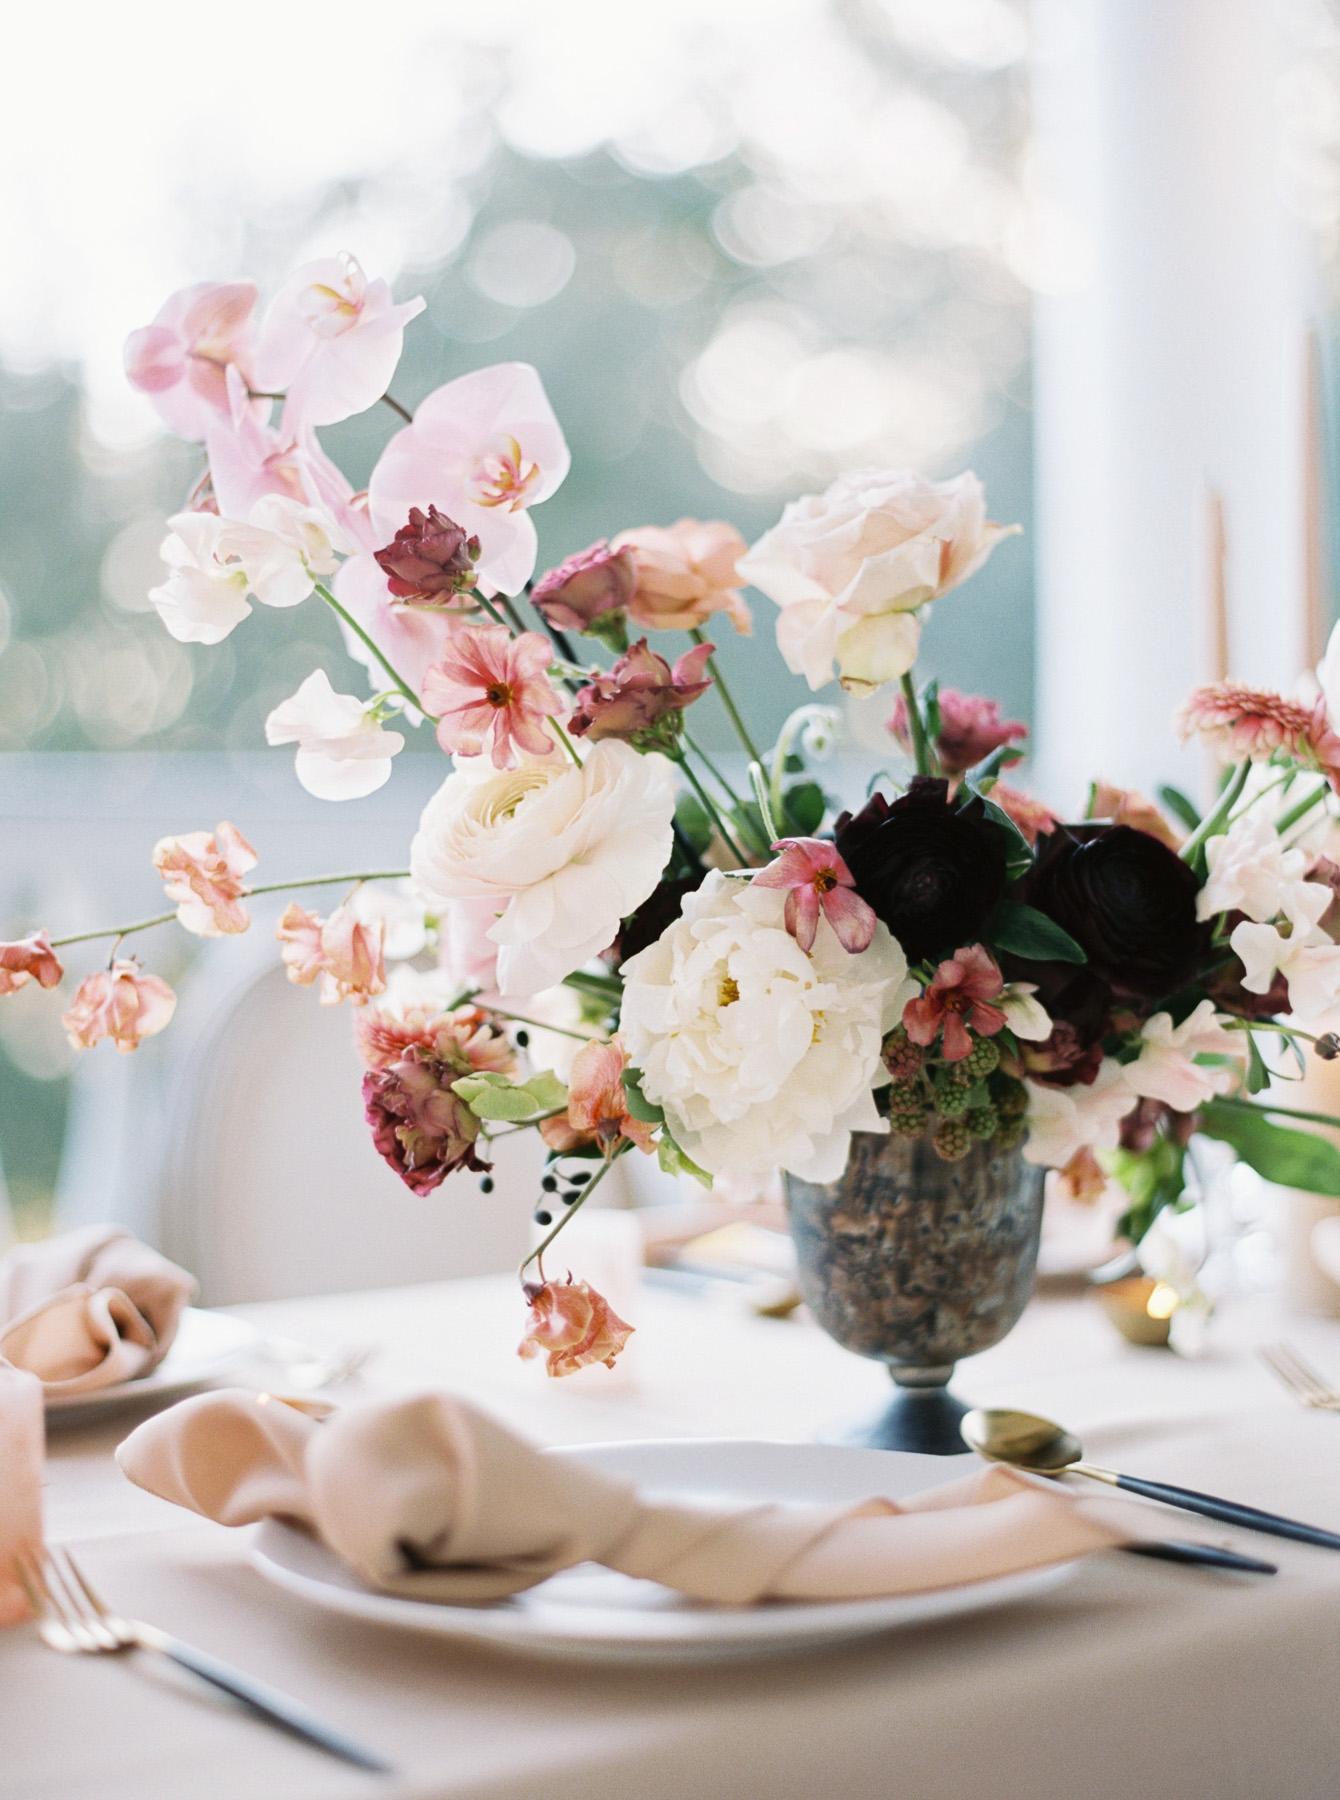 Carlos-Hernandez-Fine-Art-Film-Wedding-Photography-Charleston-SC-South-Carolina-Lowndes-Grove-Plantation-009